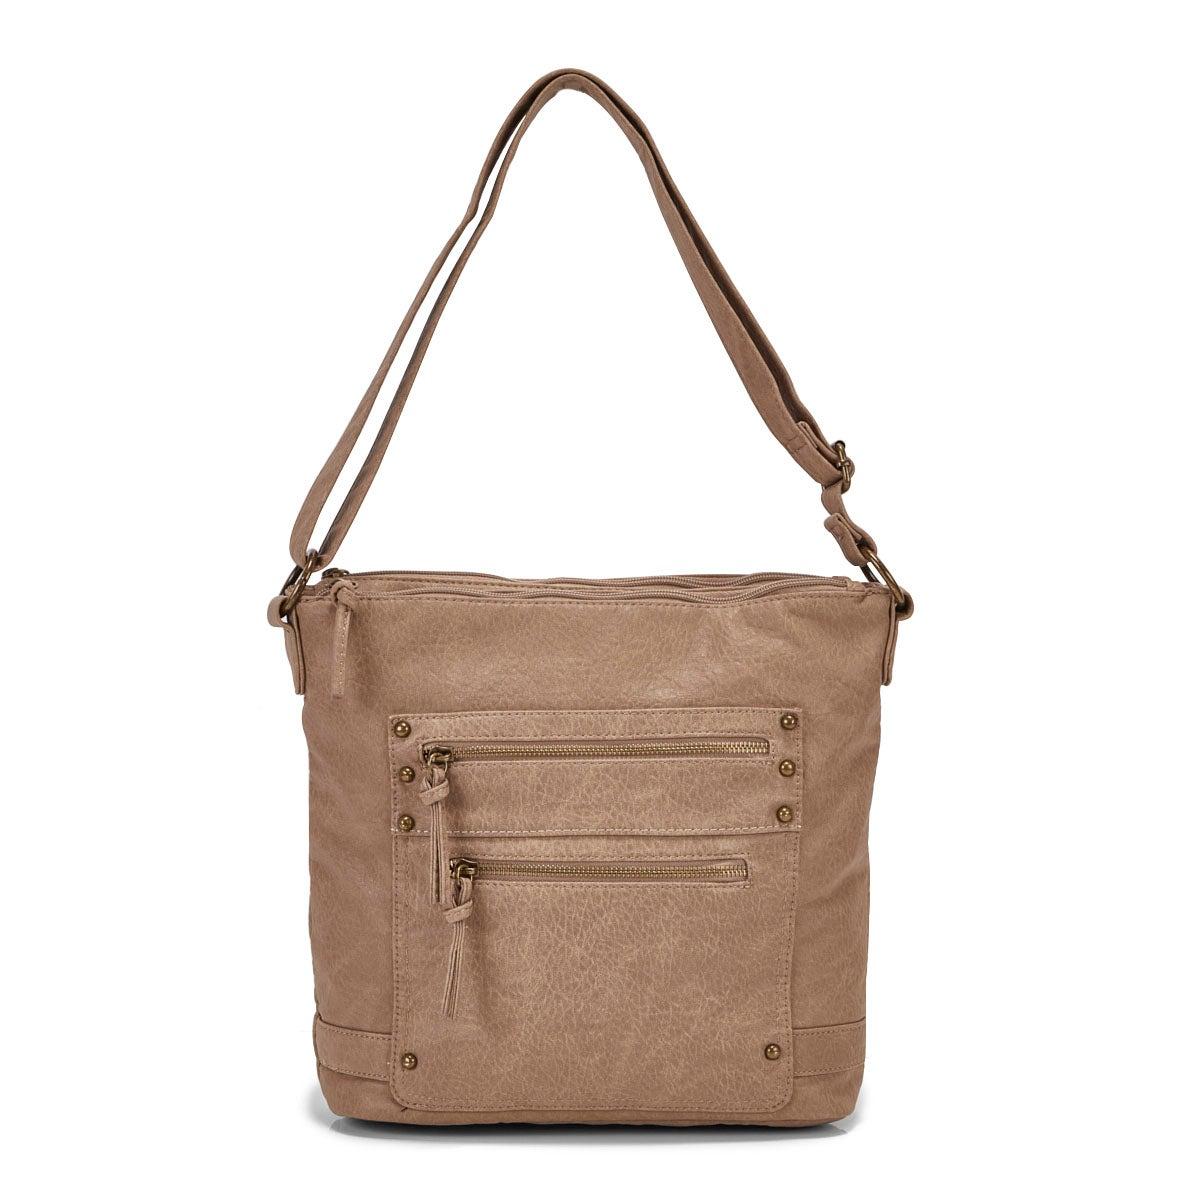 Lds sand double side zip crossbody bag